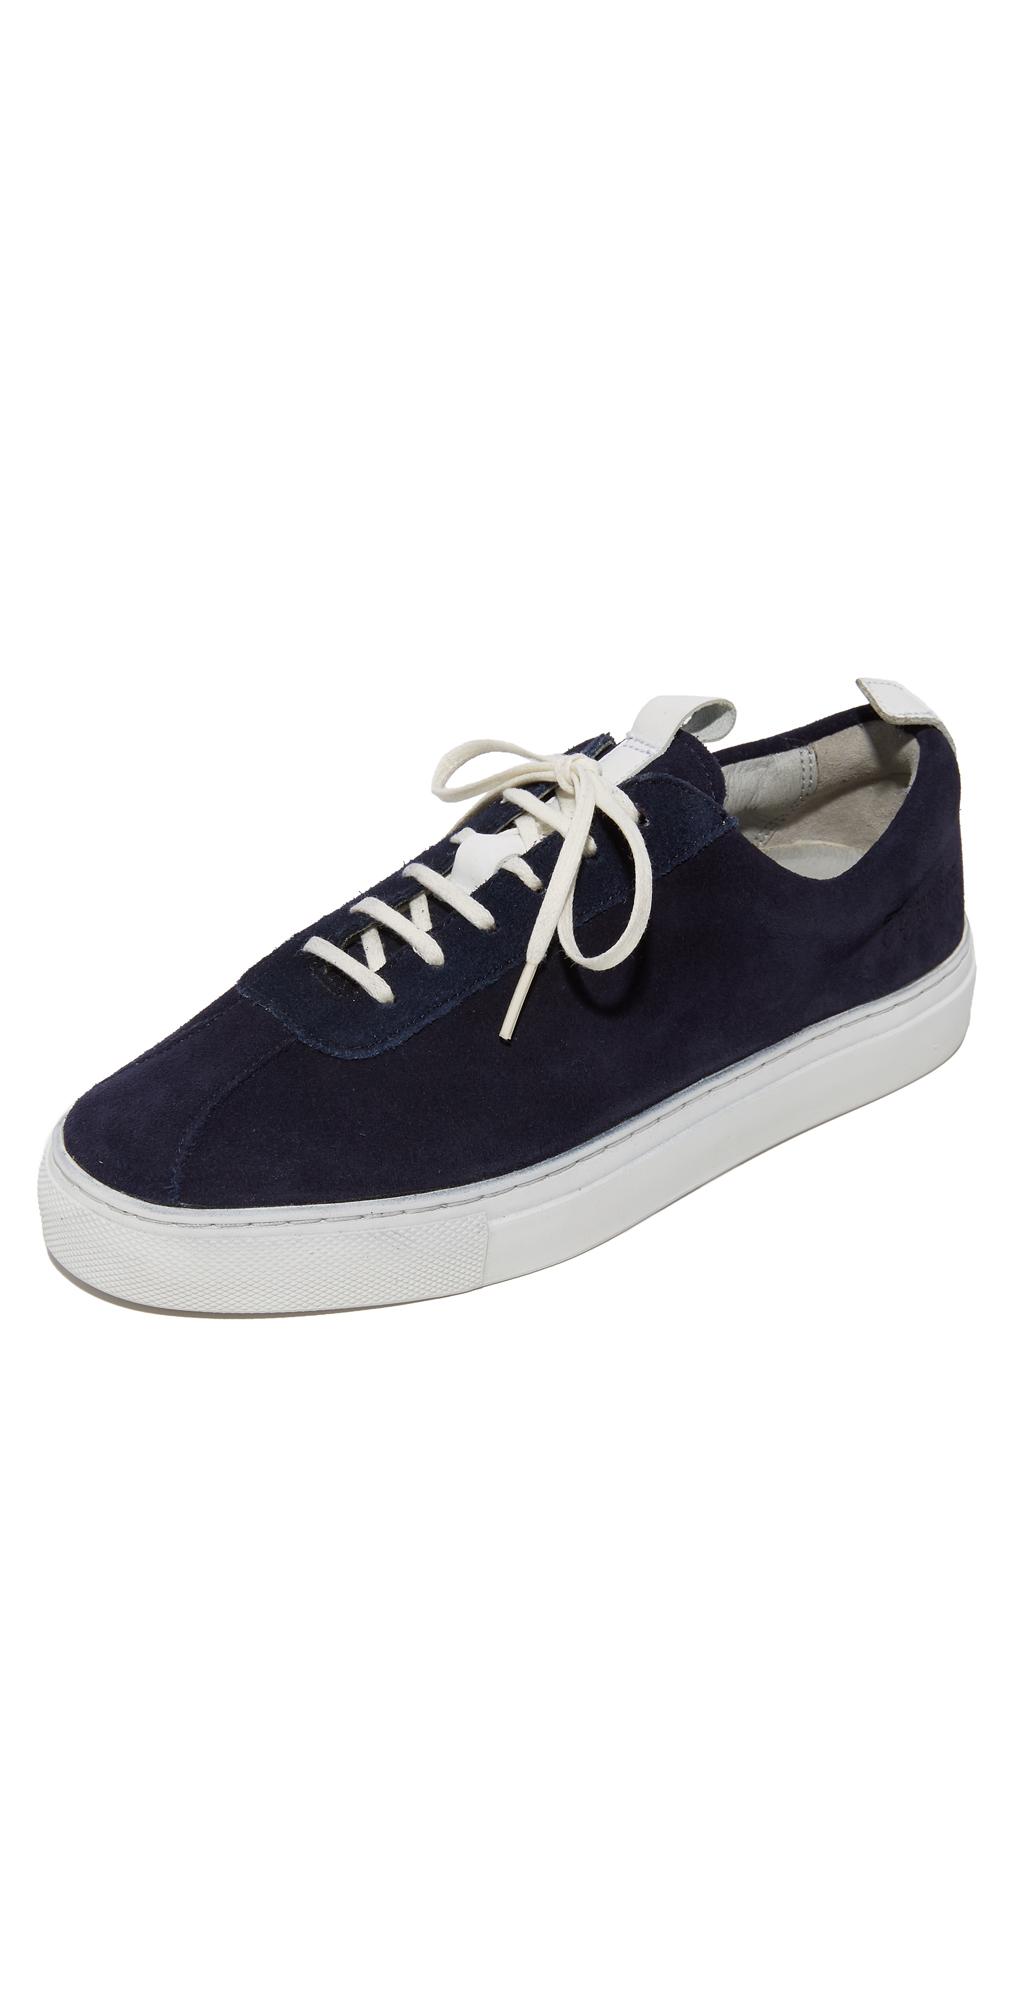 Suede Sneakers Grenson